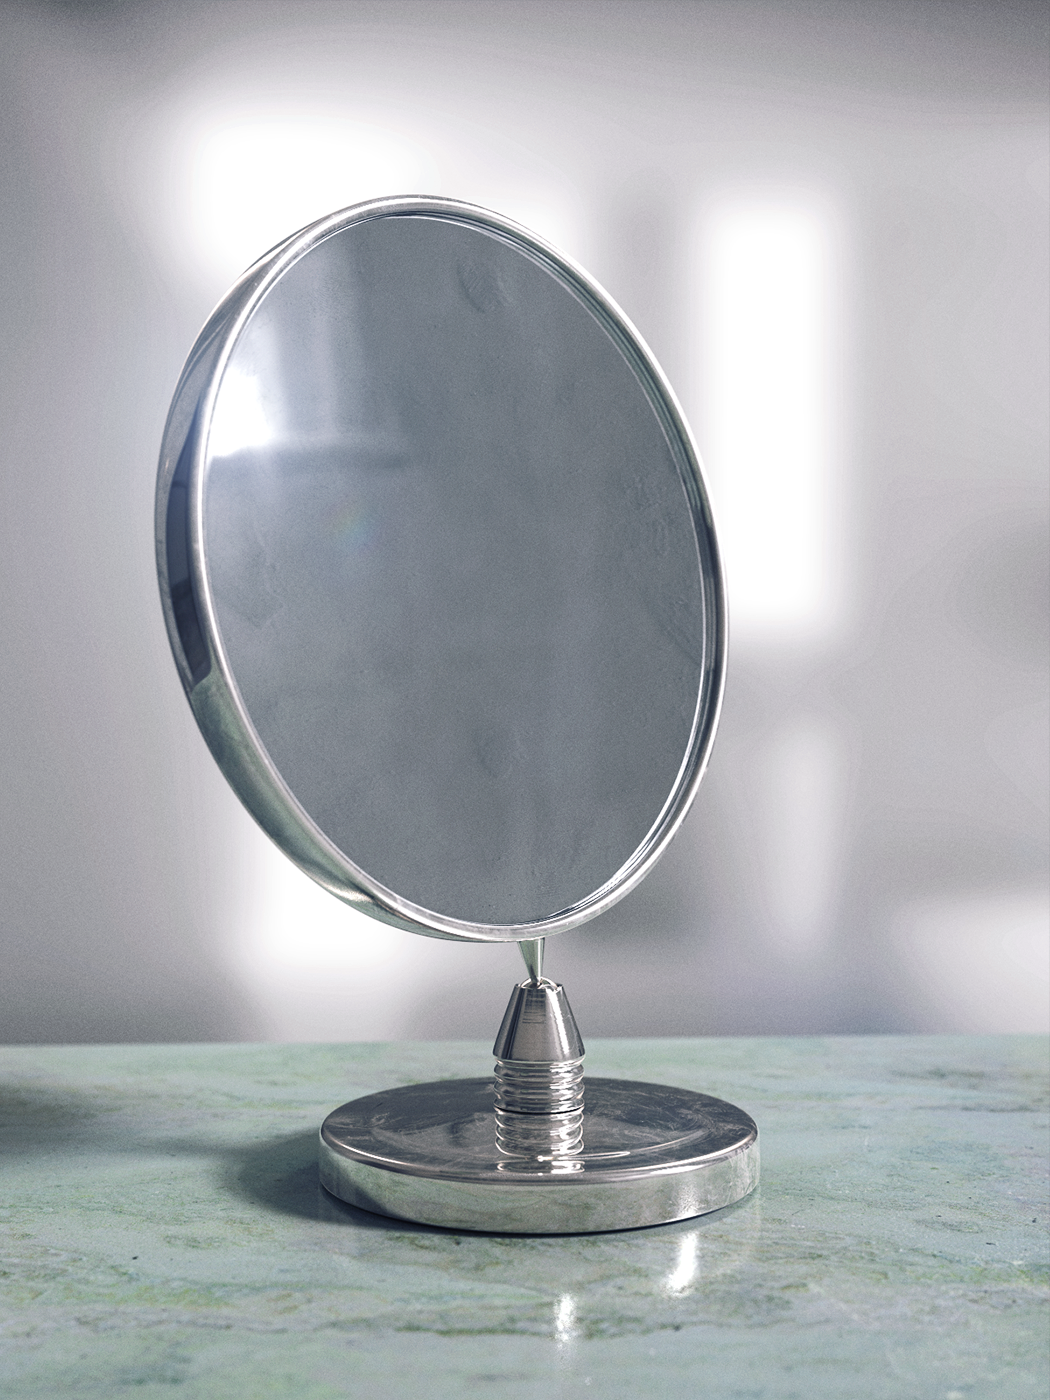 Countertop Mirror Modeled In Modo Rendered In Keyshot By